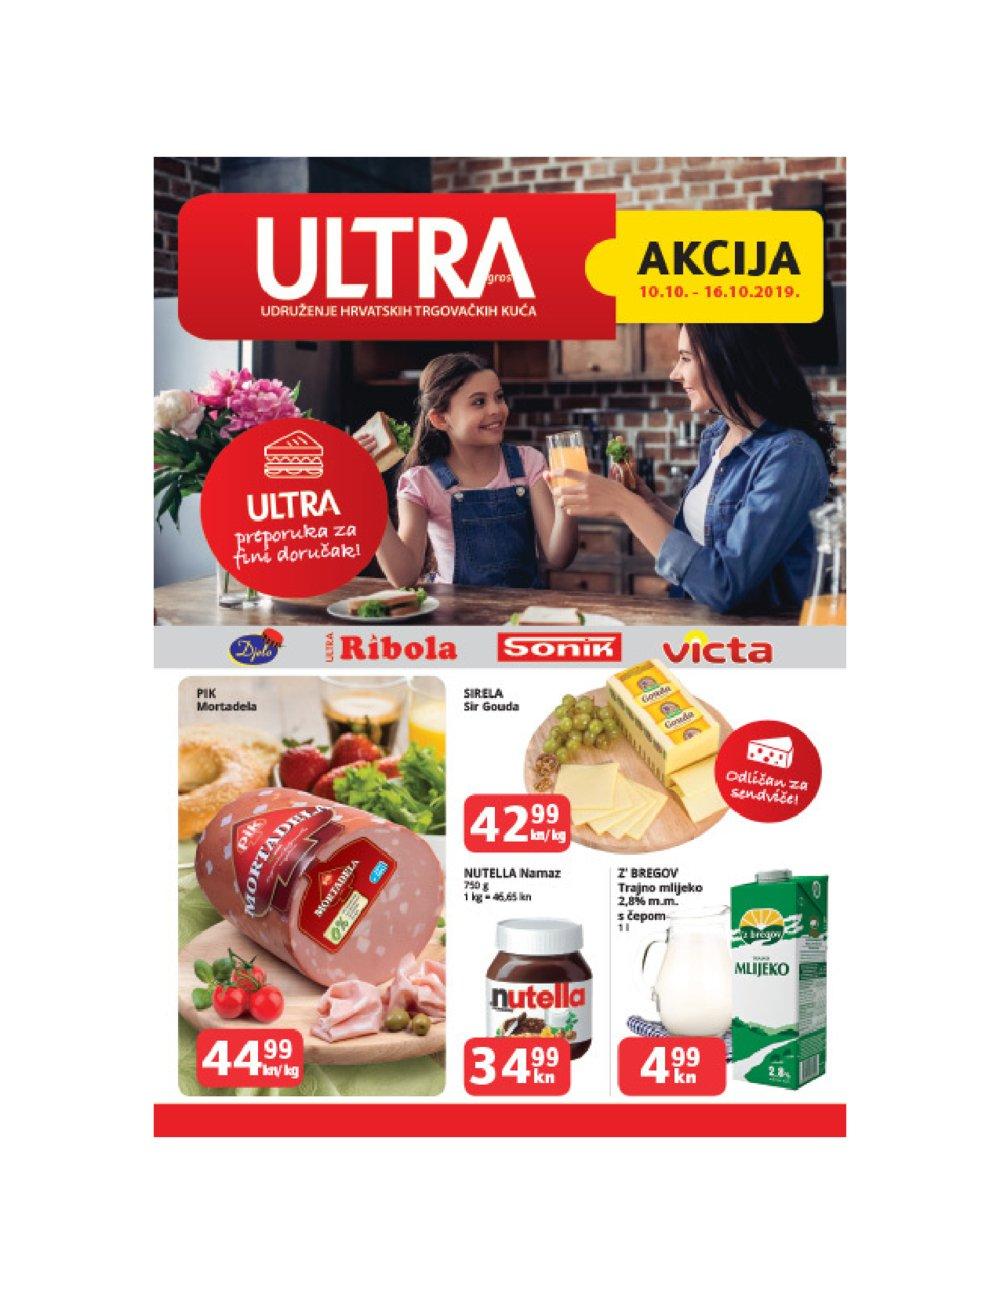 Ultra Gros katalog Akcija 10.10.-16.10.2019